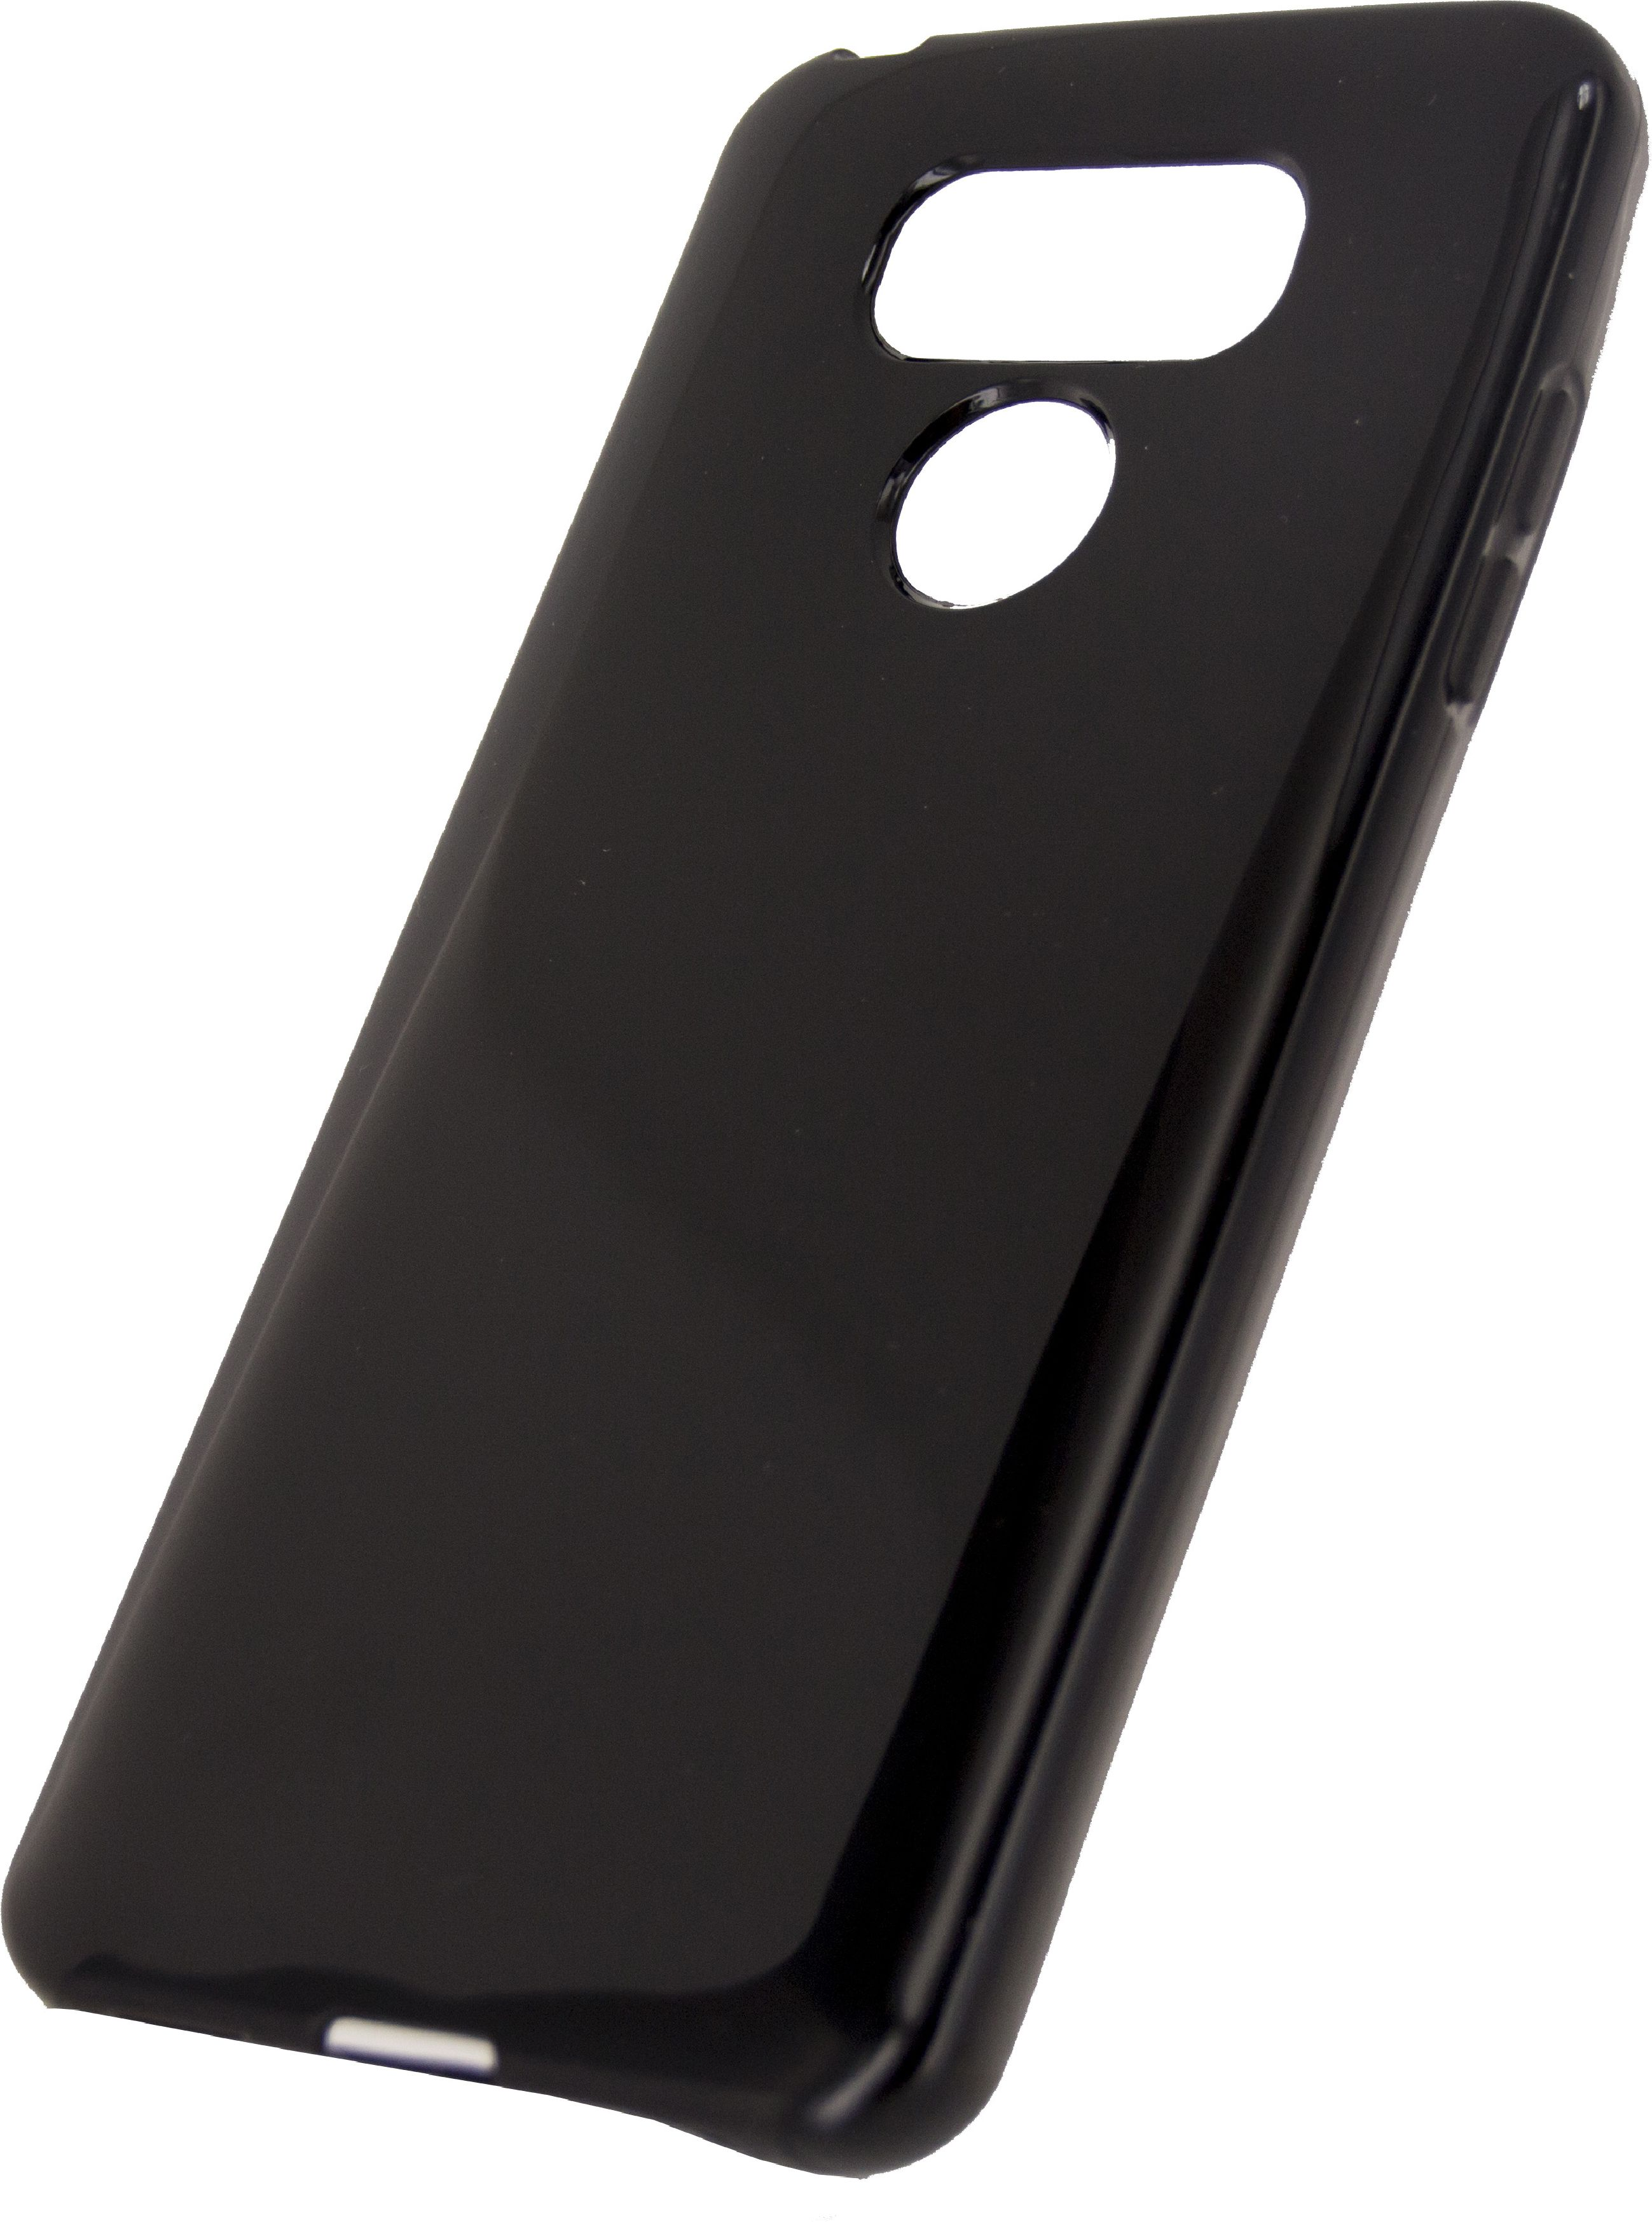 Image of   Telefon Gel-Etui LG G6 Sort